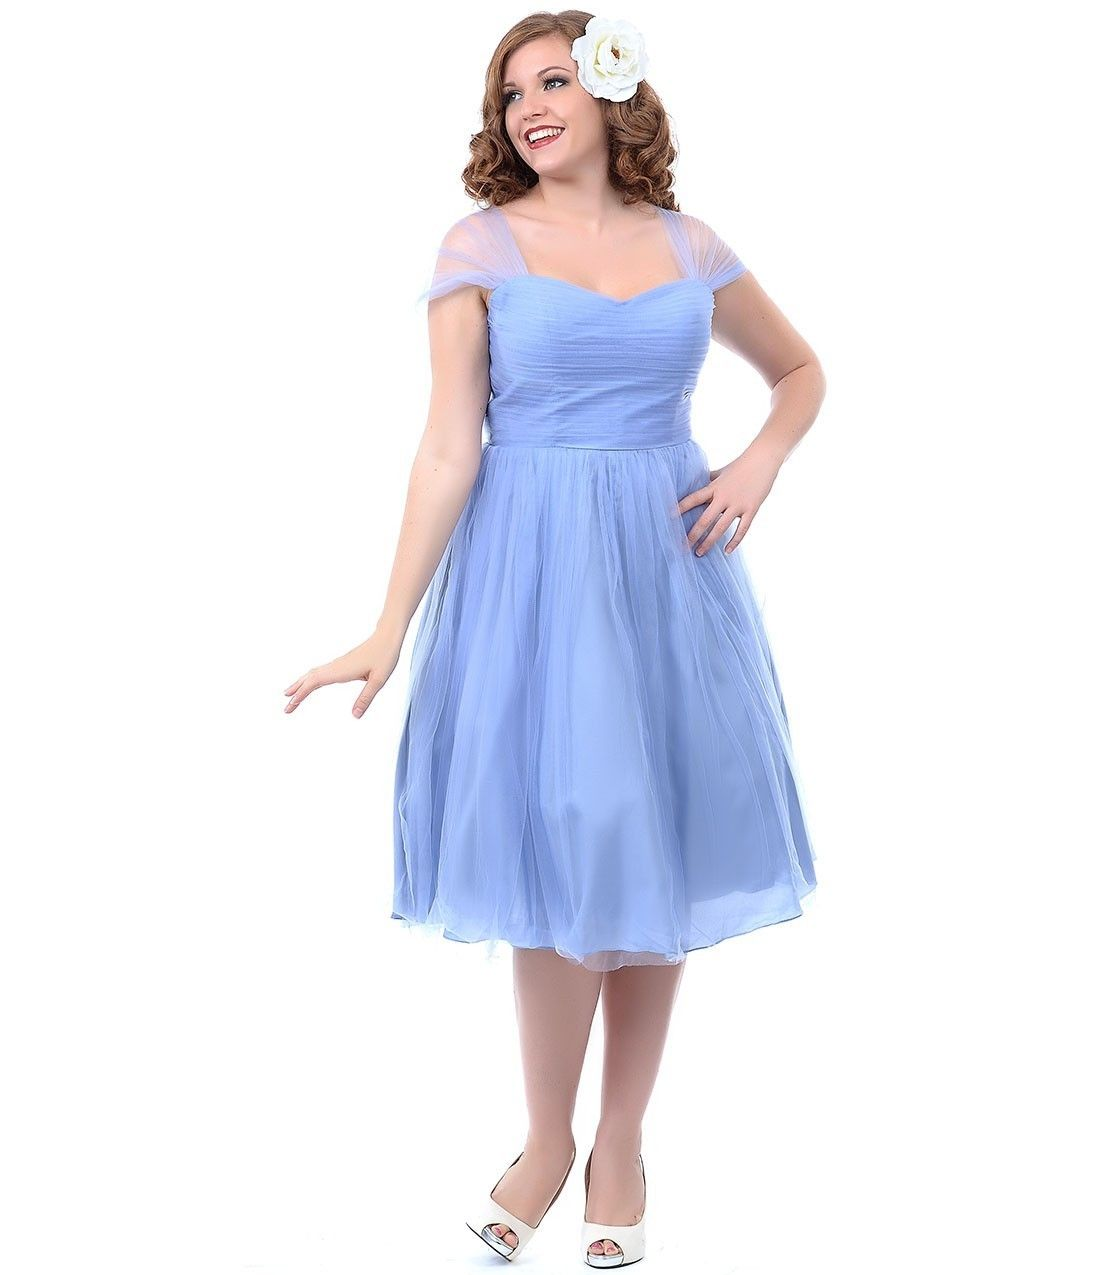 Blue plus size wedding dresses  Brides Guide To Plus Size Bridesmaid Dresses  Bridesmaid Dresses